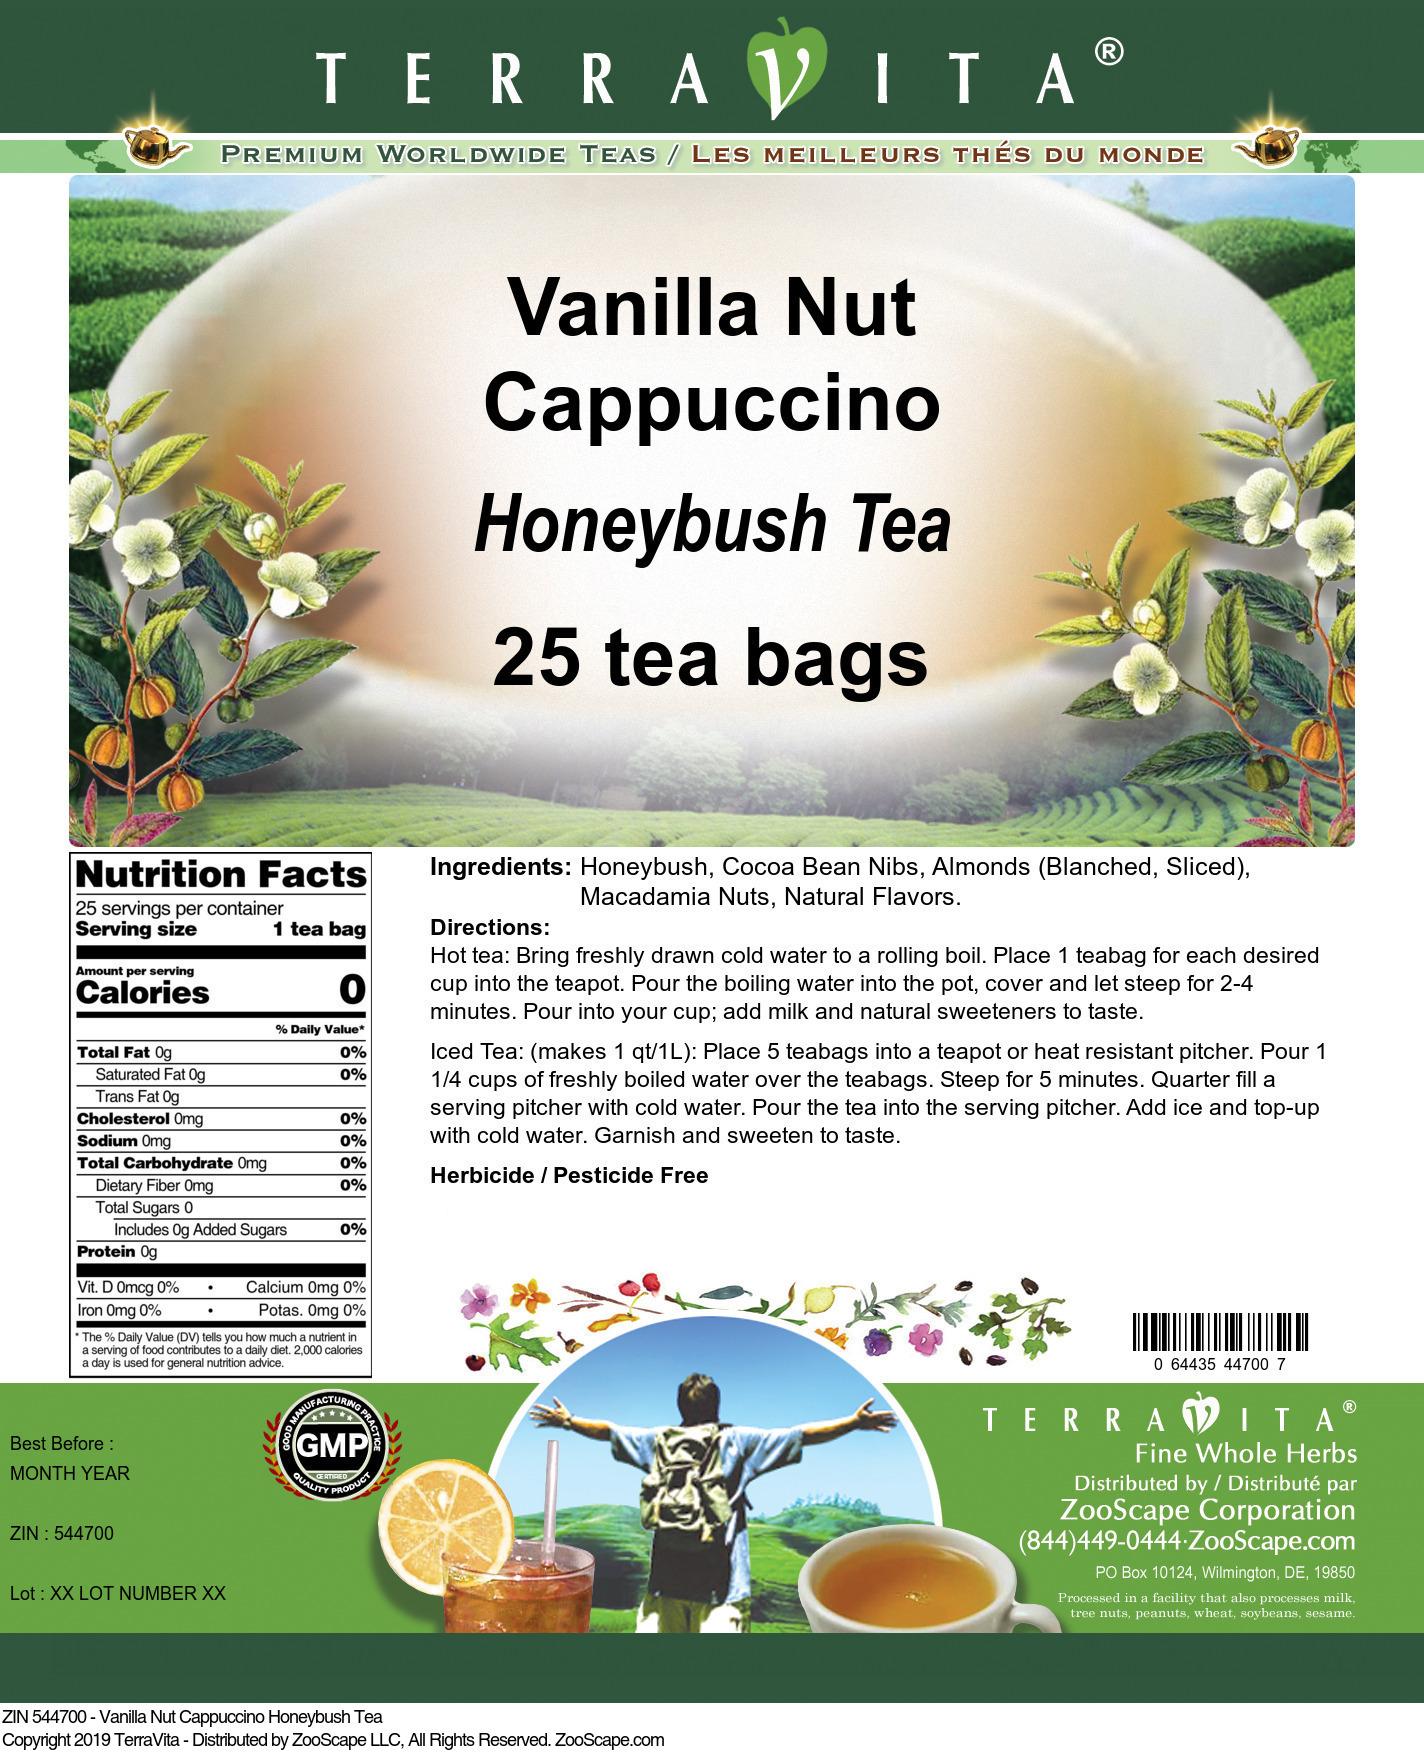 Vanilla Nut Cappuccino Honeybush Tea